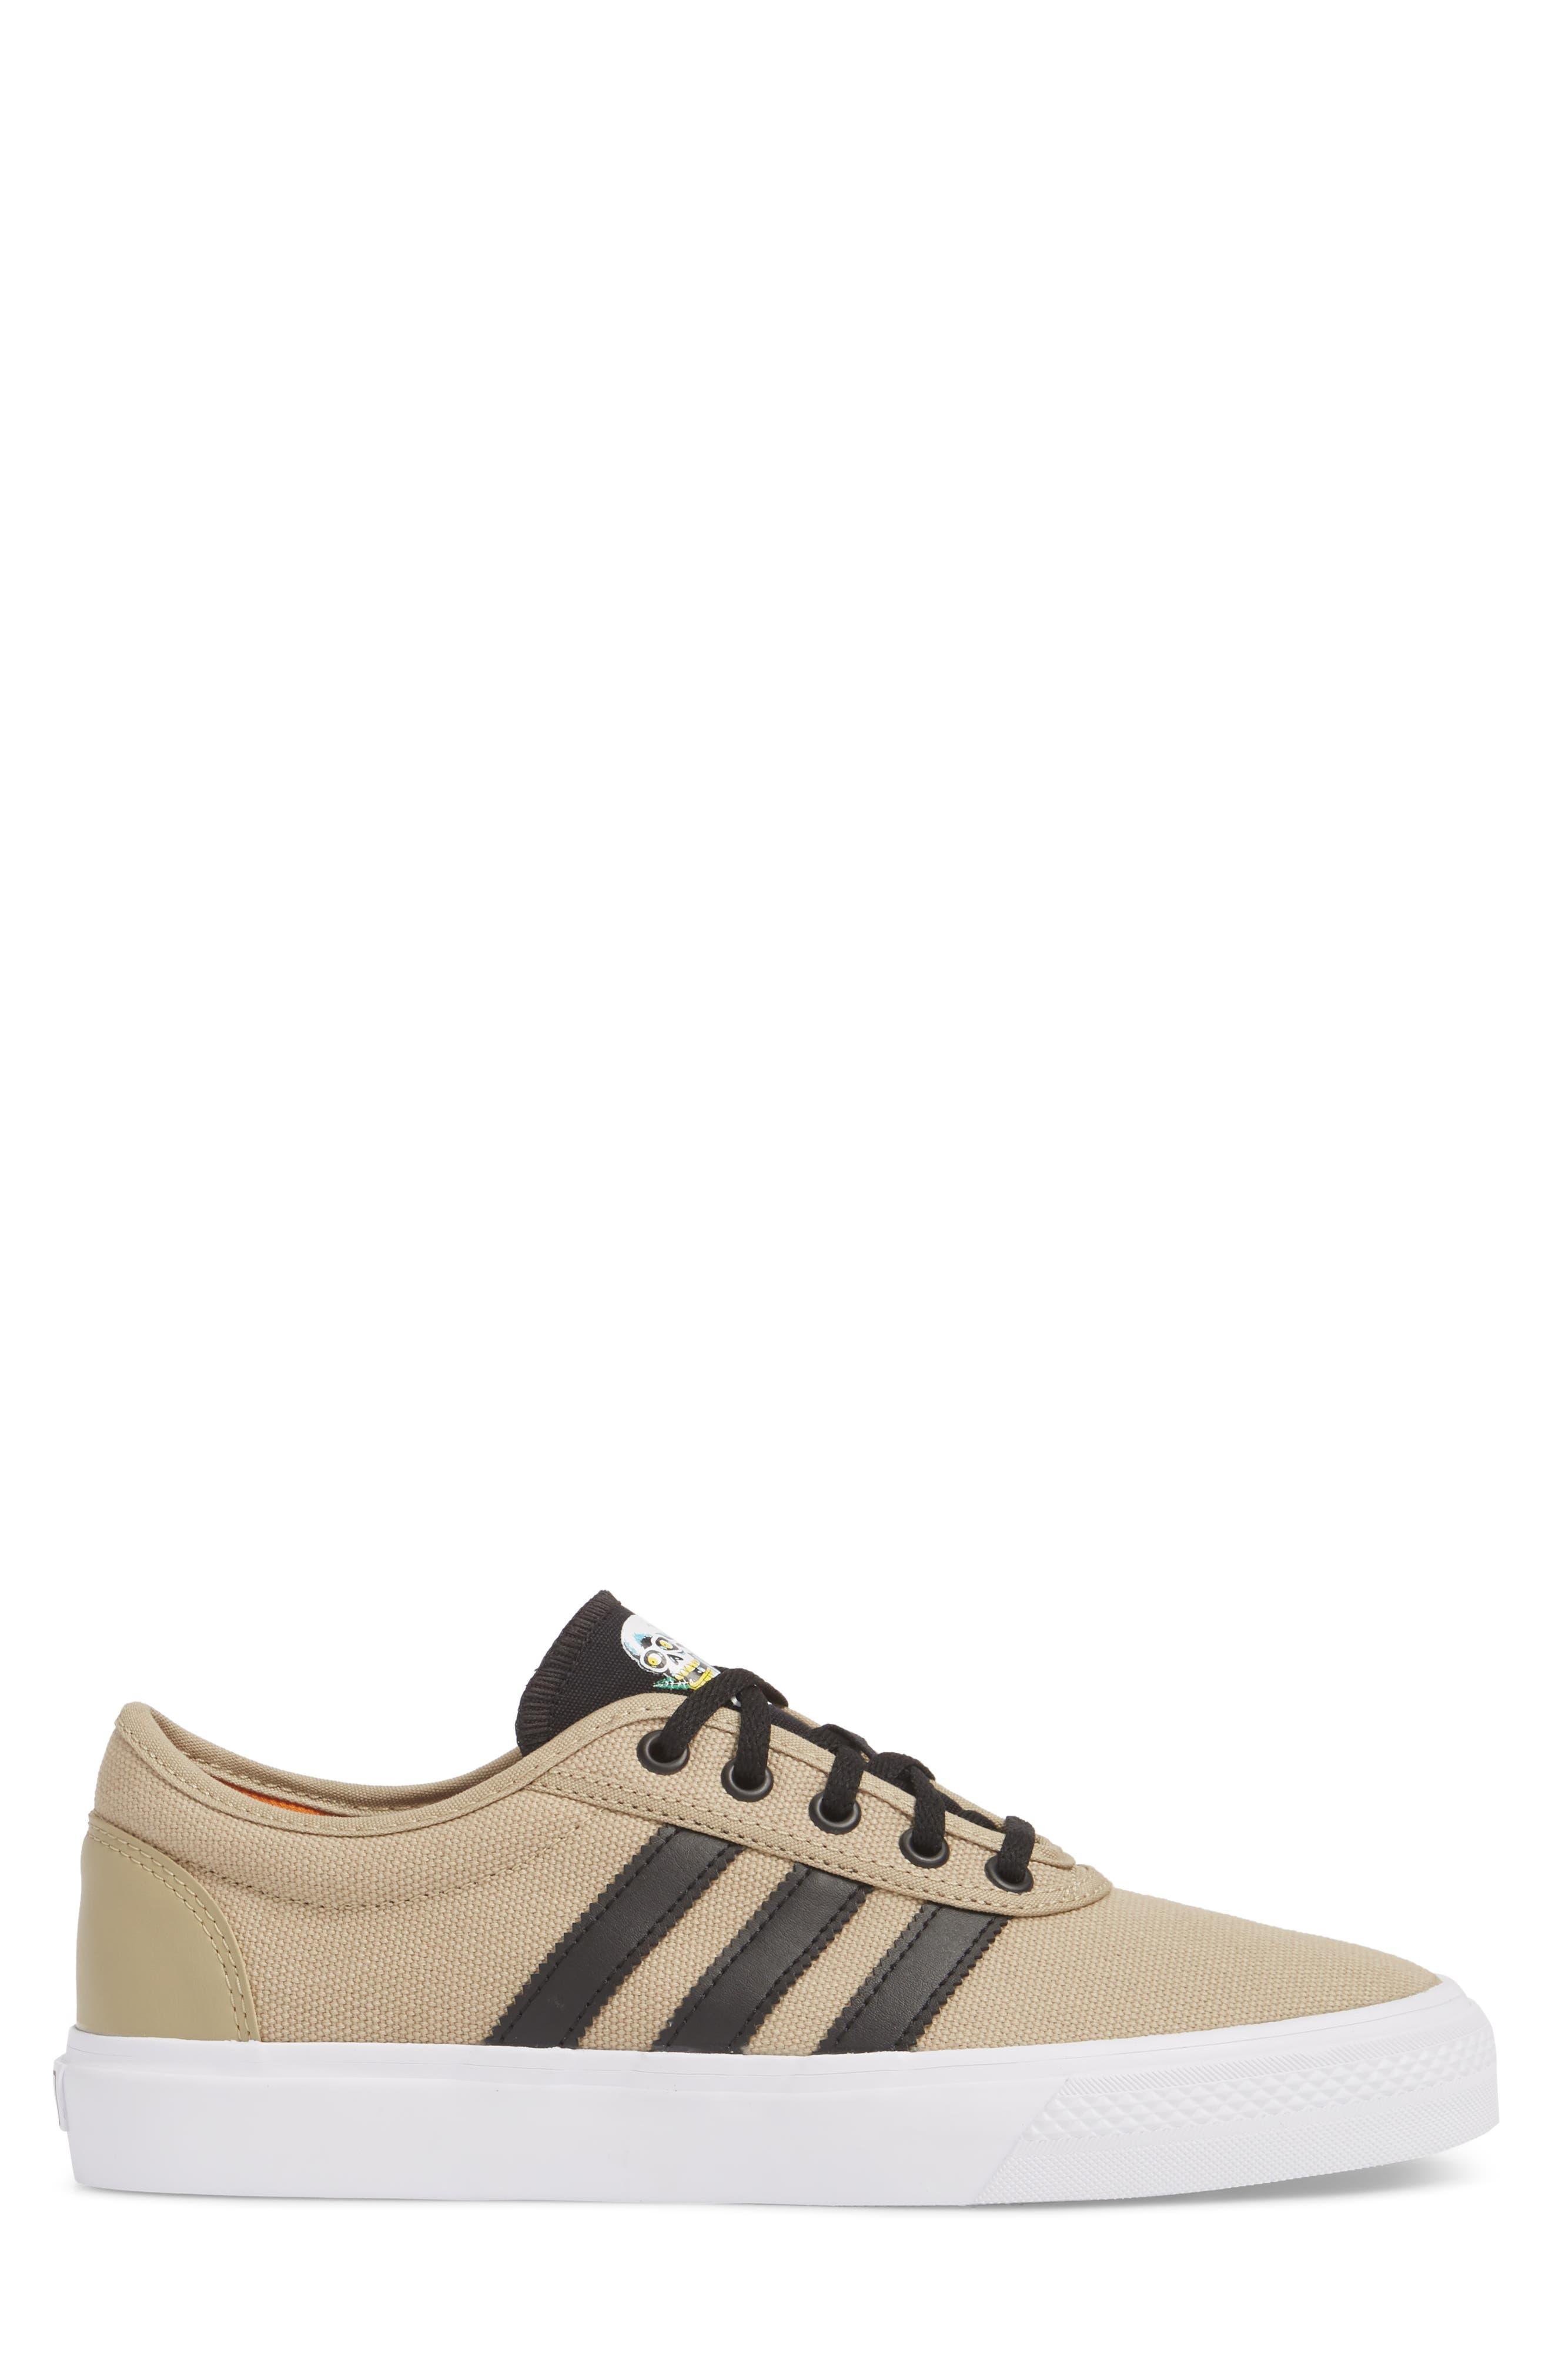 Adiease Premiere Skateboarding Sneaker,                             Alternate thumbnail 3, color,                             GOLD/ CORE BLACK/ WHITE